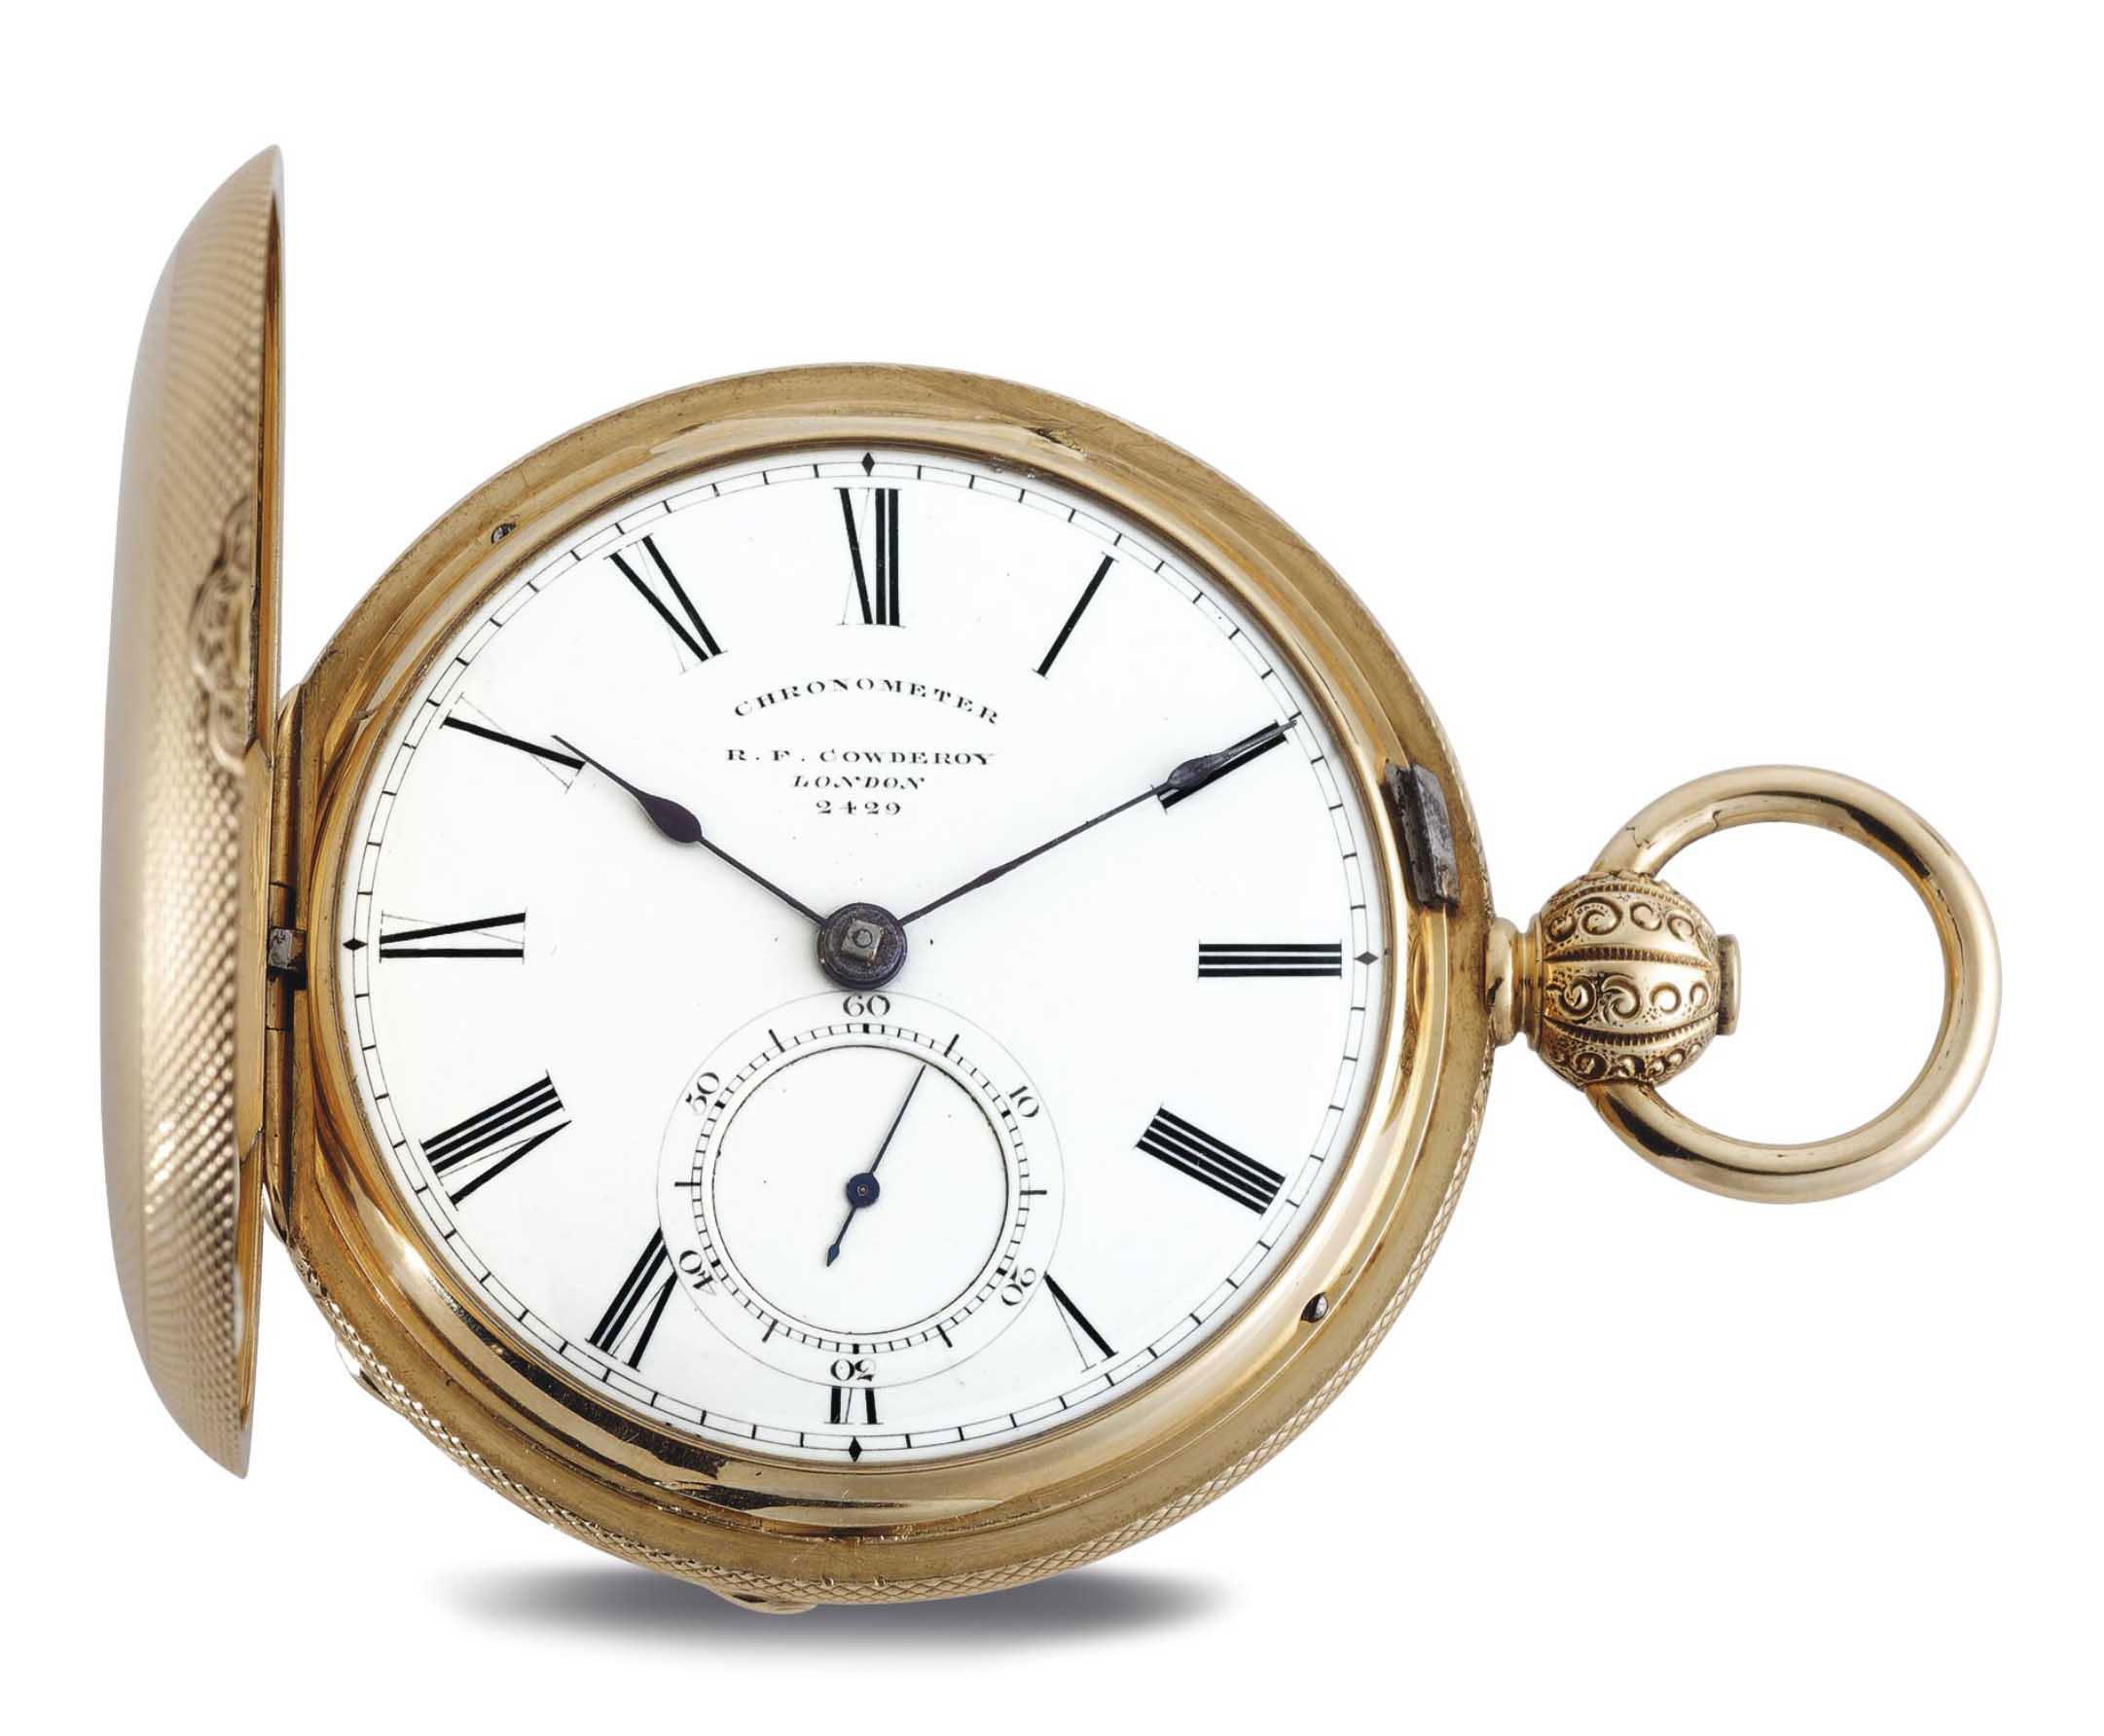 R.F. COWDEROY. AN 18K GOLD HUNTER CASE POCKET CHRONOMETER